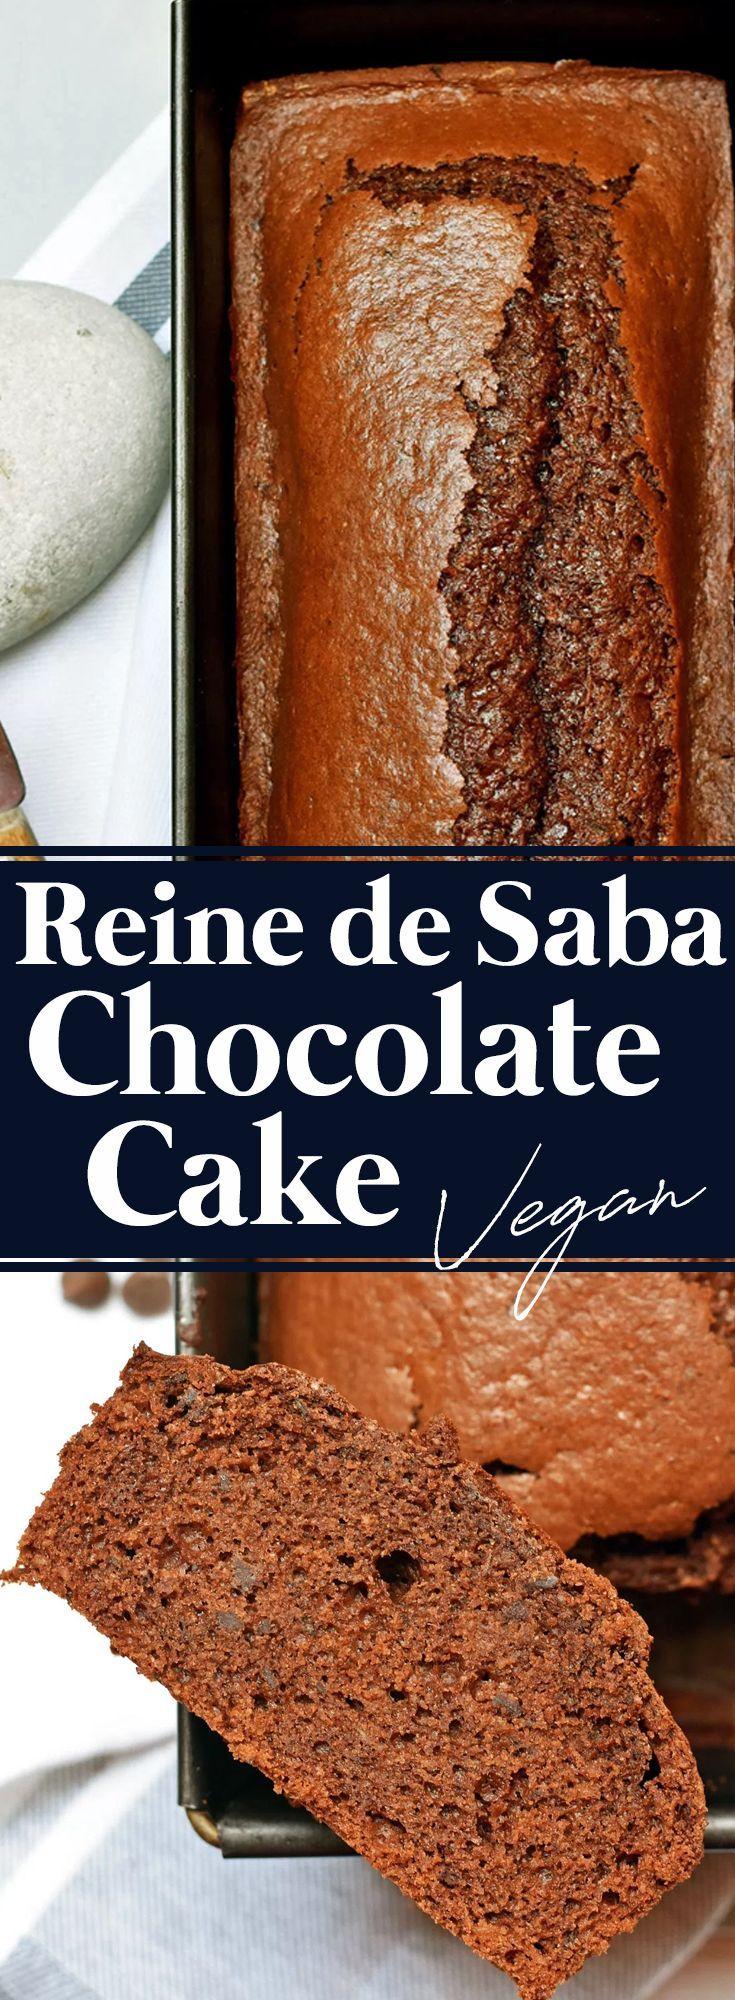 Reine de Saba Chocolate Cake | Vegan | Pardon Your French